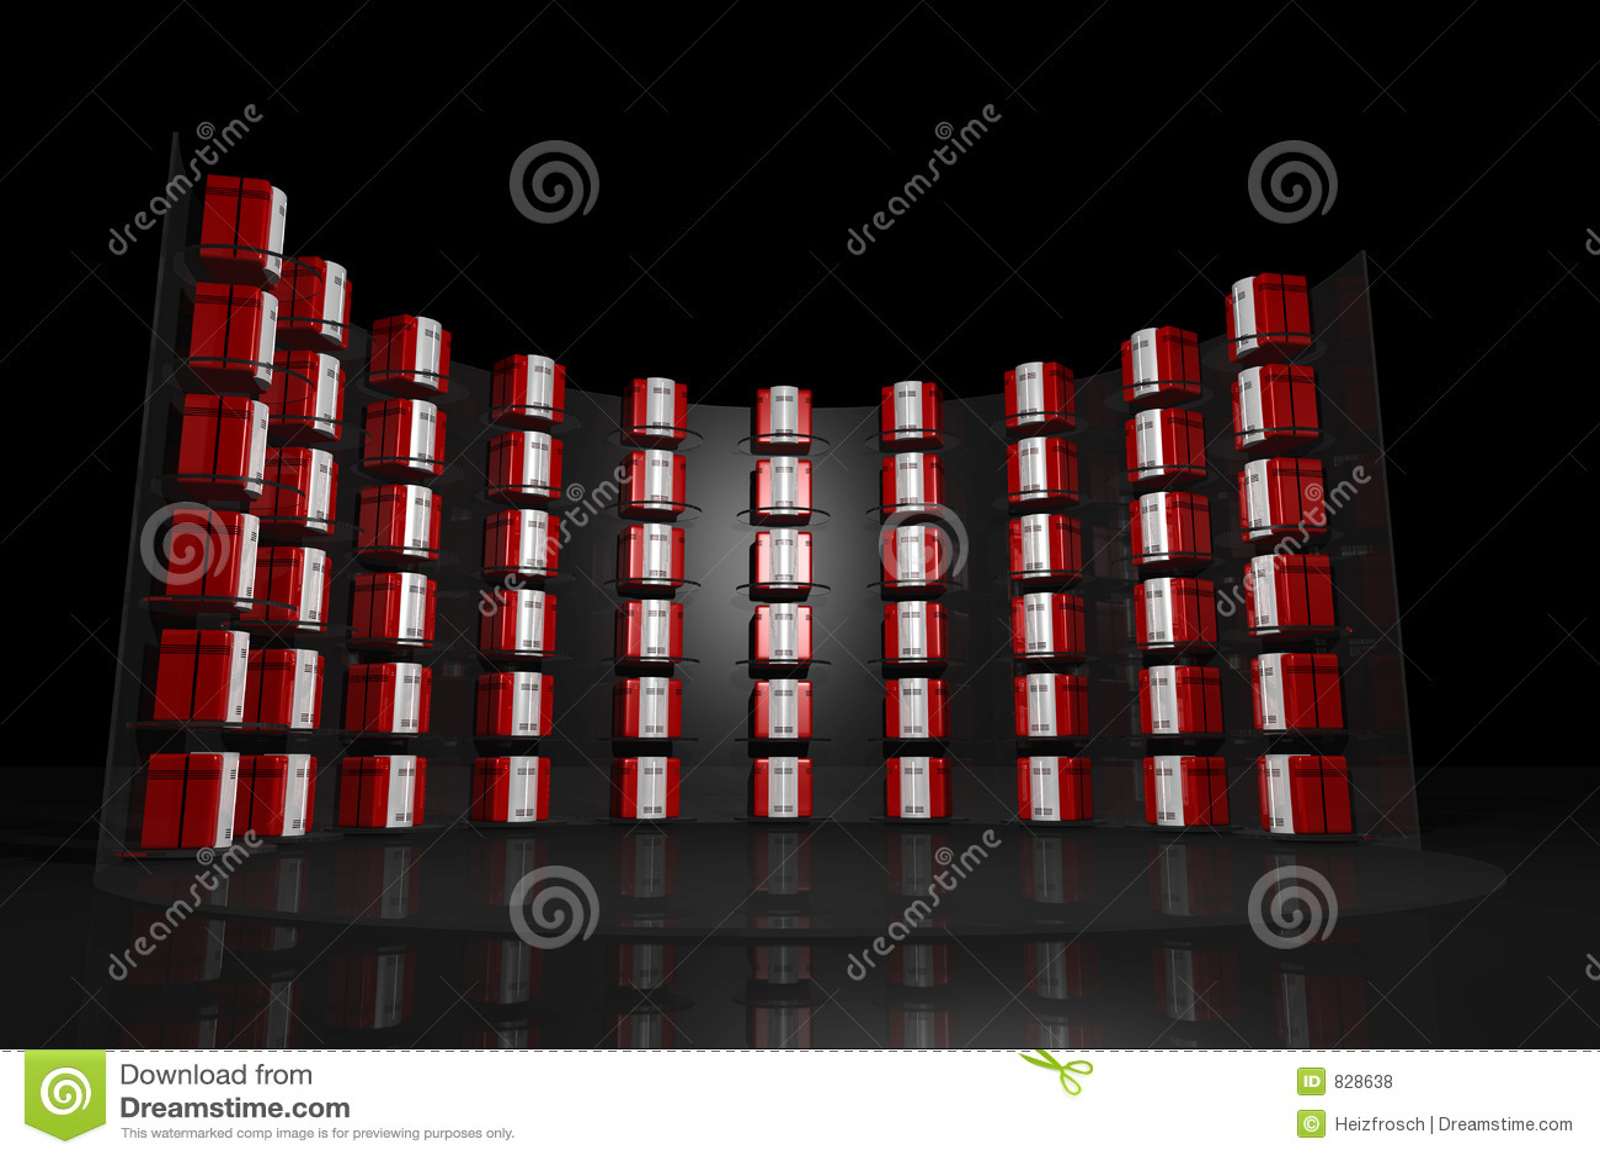 Server rack black